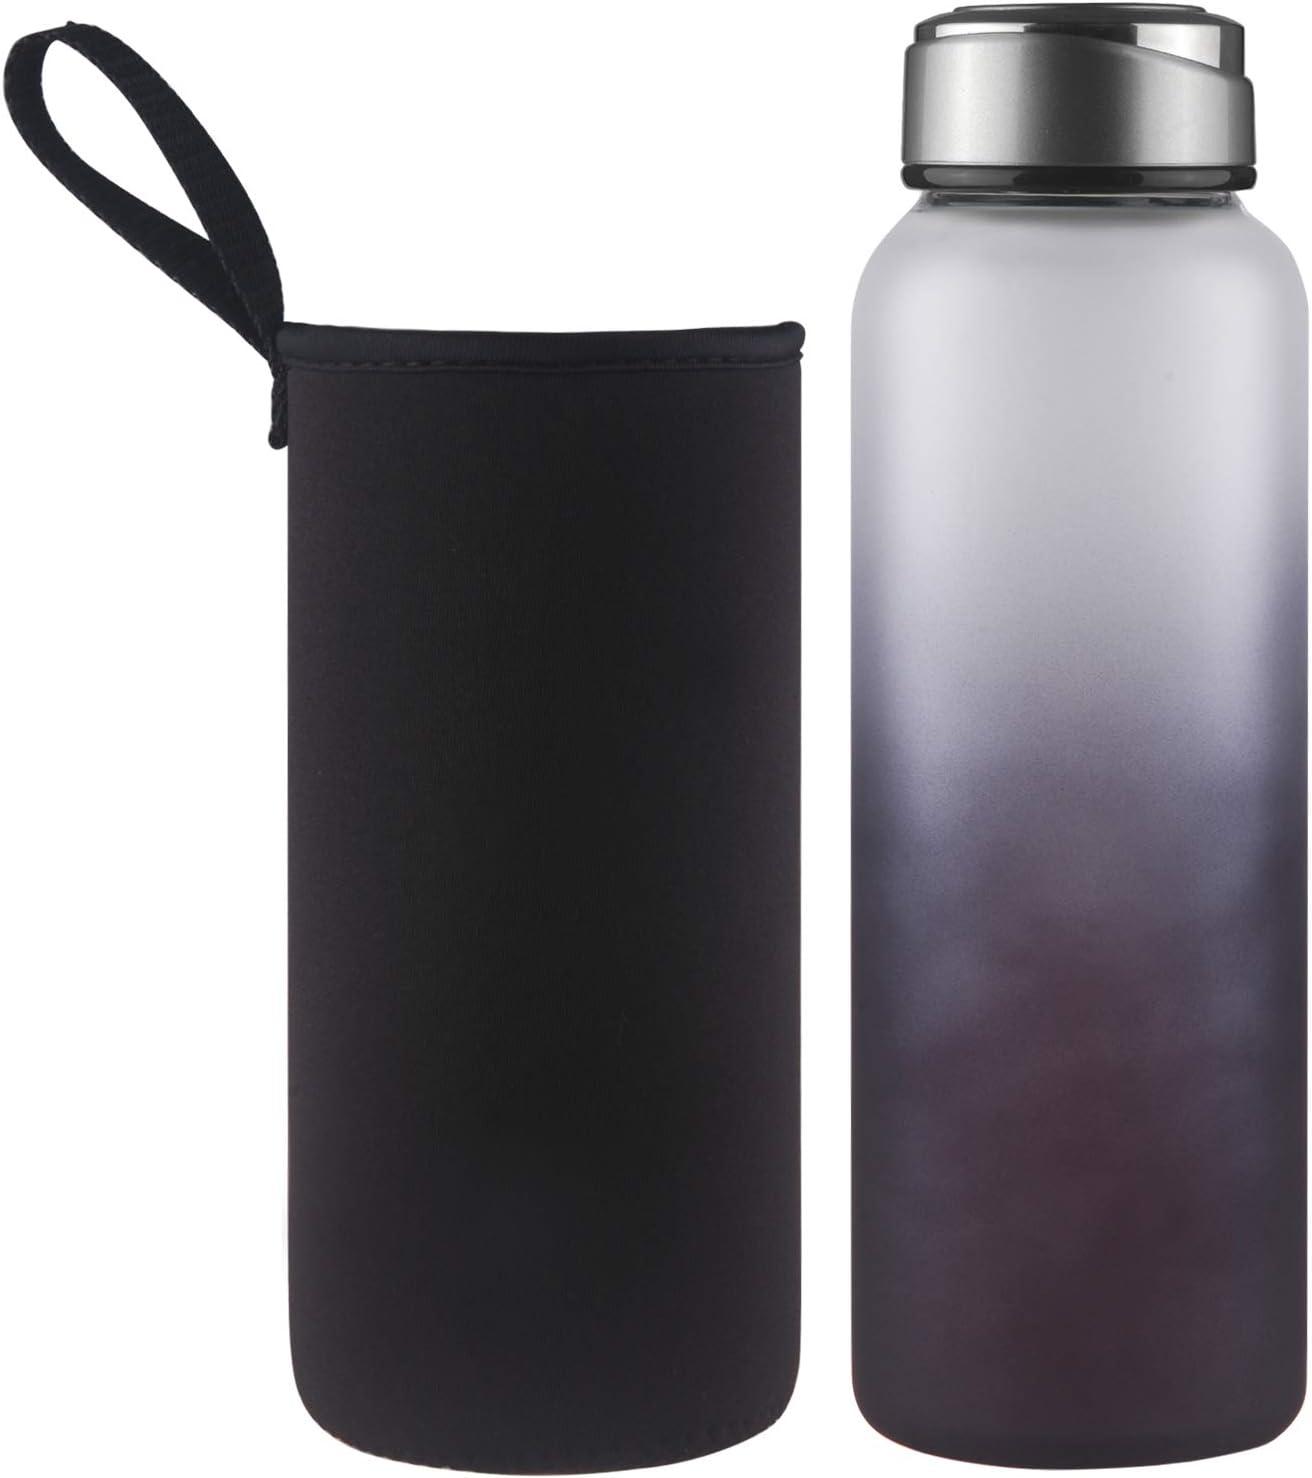 DEARRAY Botella de Agua de Cristal de Borosilicato Deportivo1000ml / 1 Litro, Botella de Agua de Vidrio con Funda de Neopreno y Elegante Tapa de Acero Inoxidable